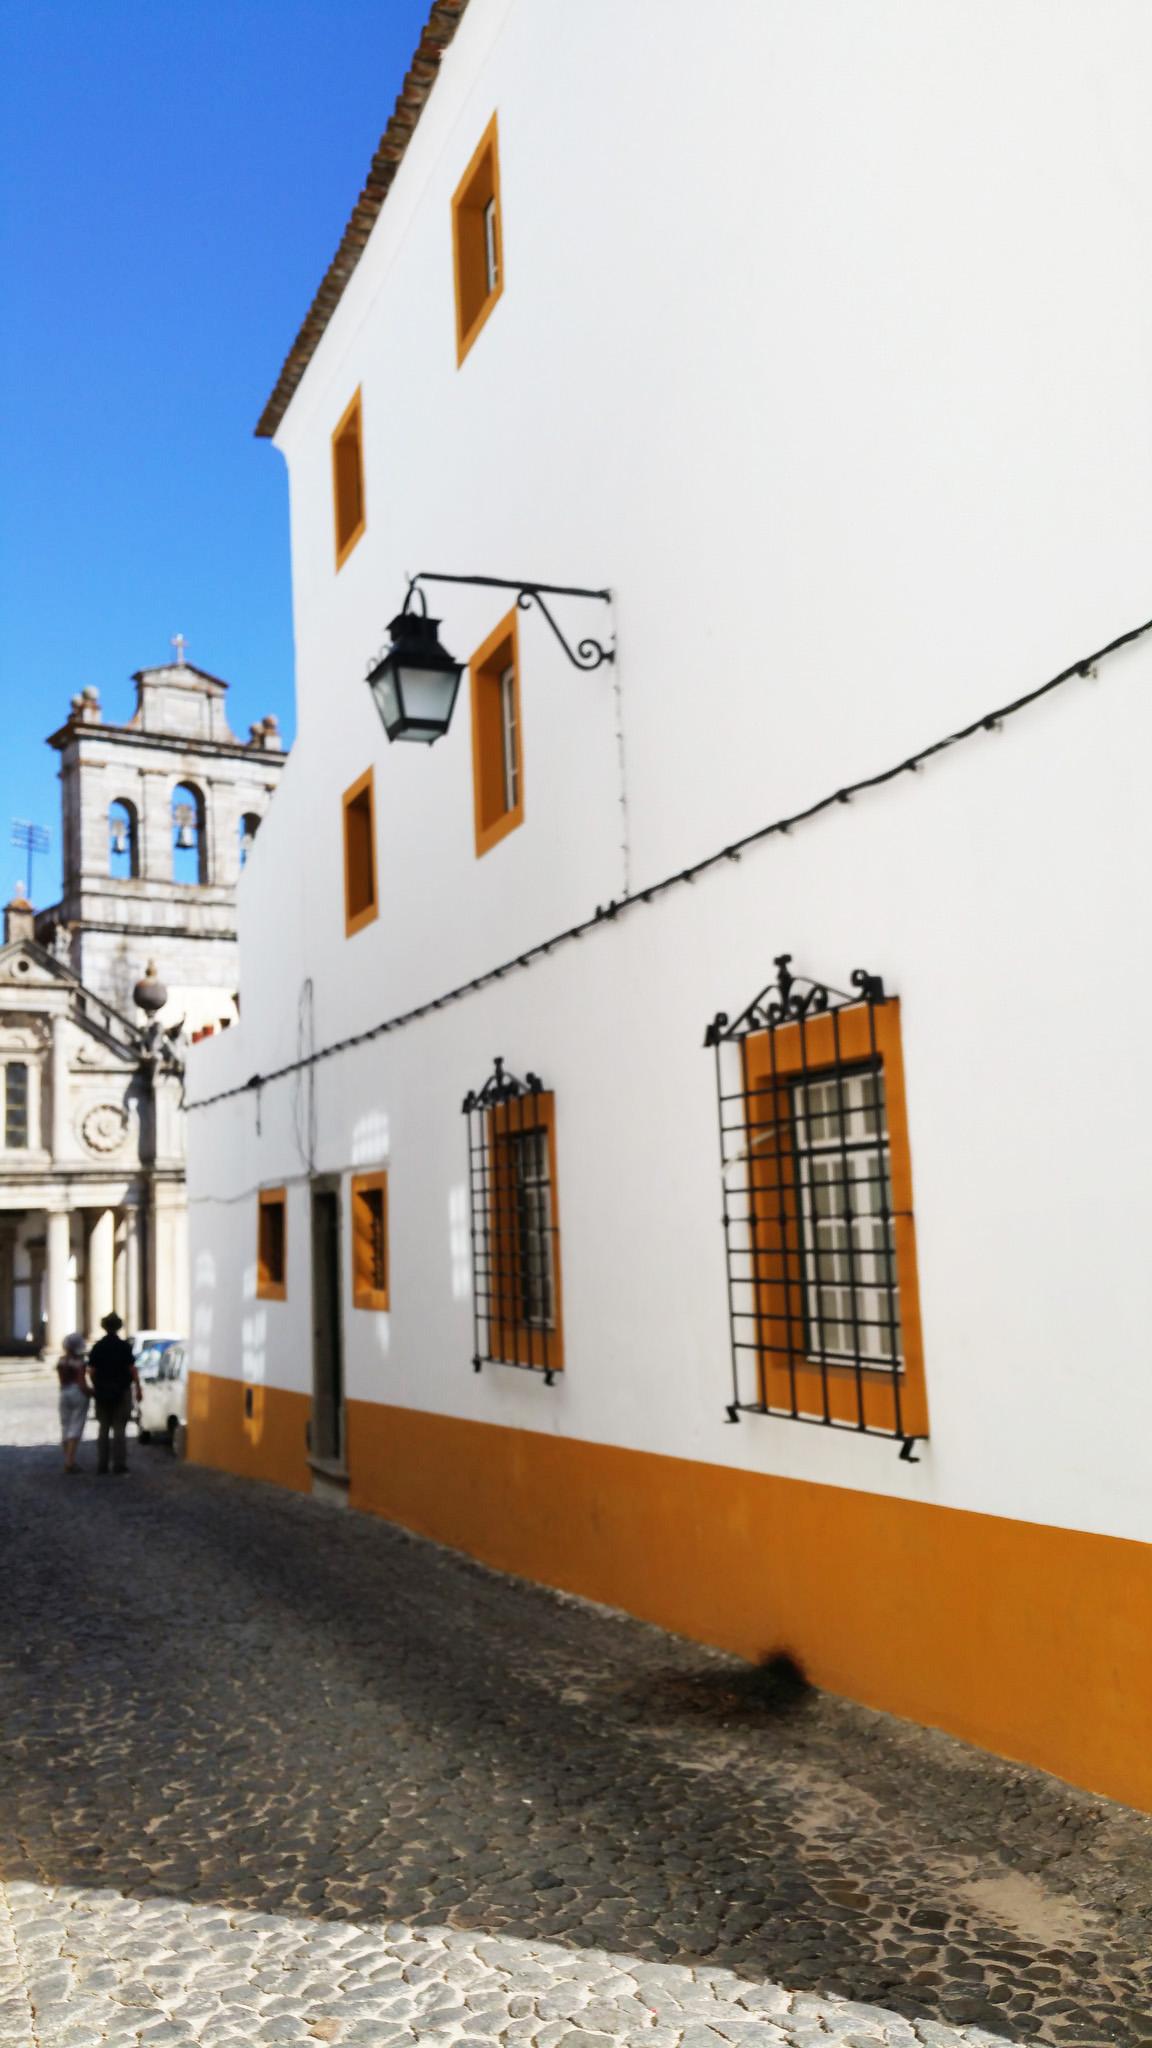 soi55_travel_blog_portugal_evora_architecture_colour_tall